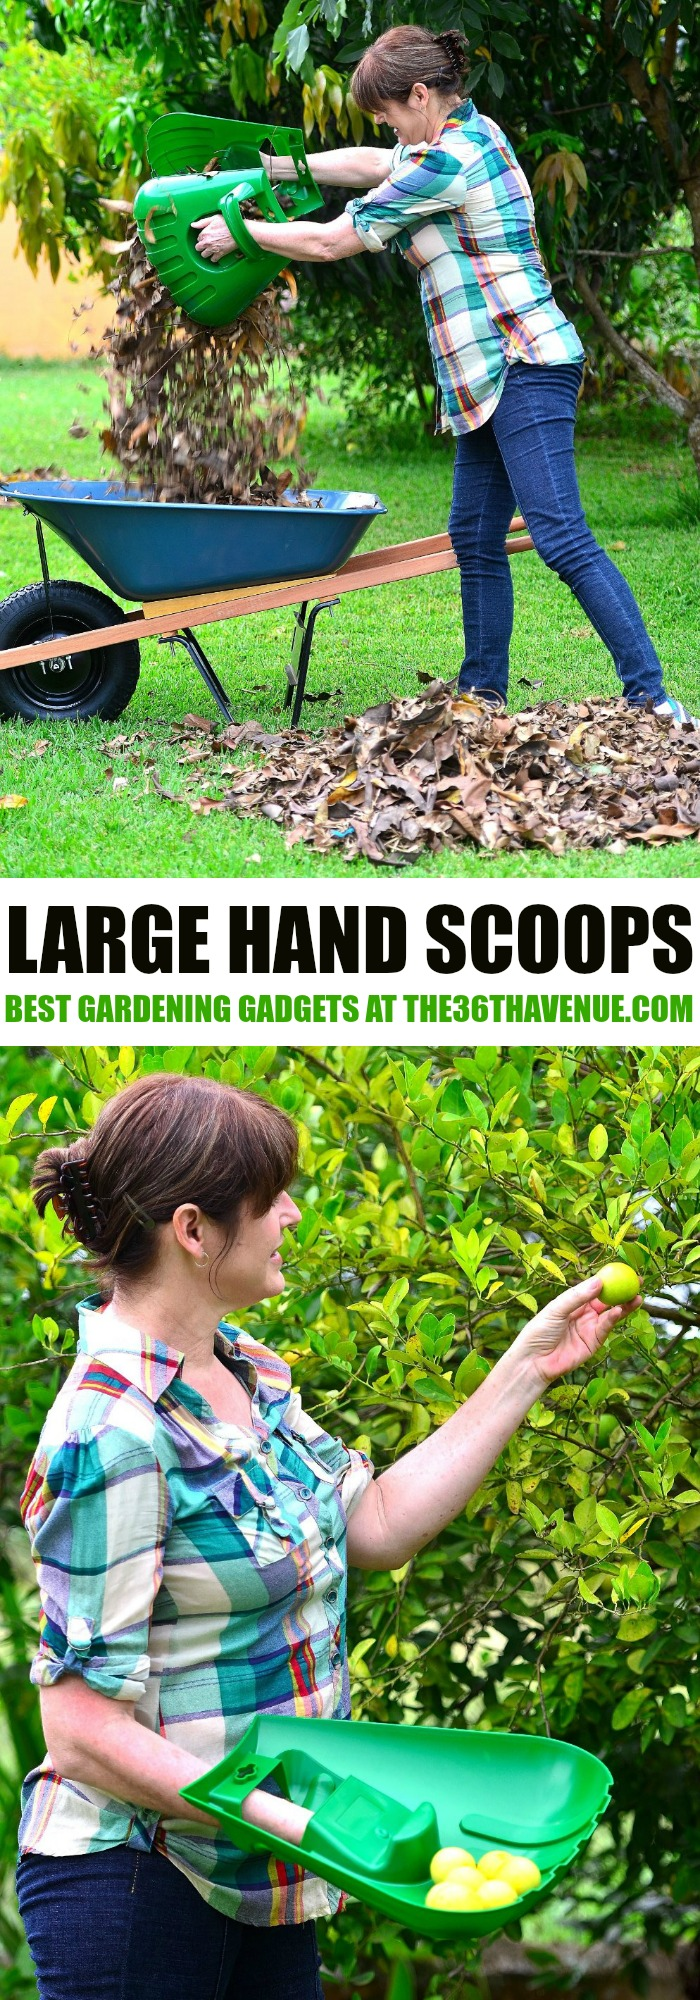 Gardening Gadgets 10 the36thavenue.com